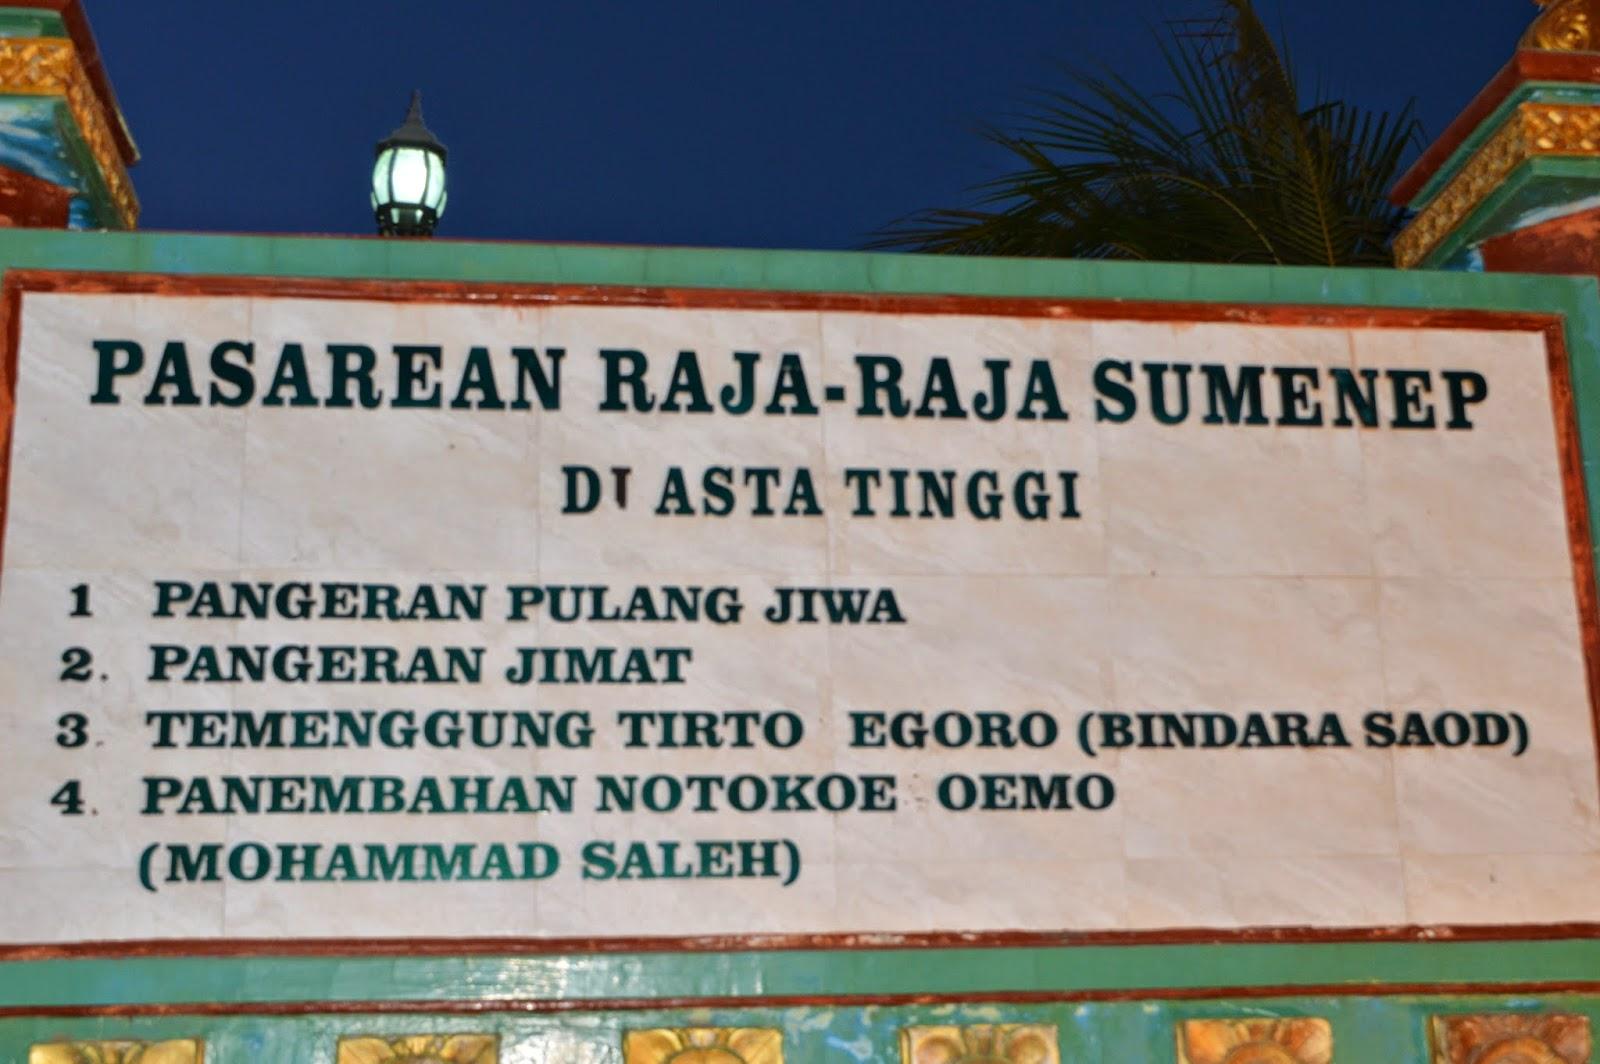 Madura Wisata Maret 2015 Kawasan Pemakaman Khusus Pembesar Raja Kerabat